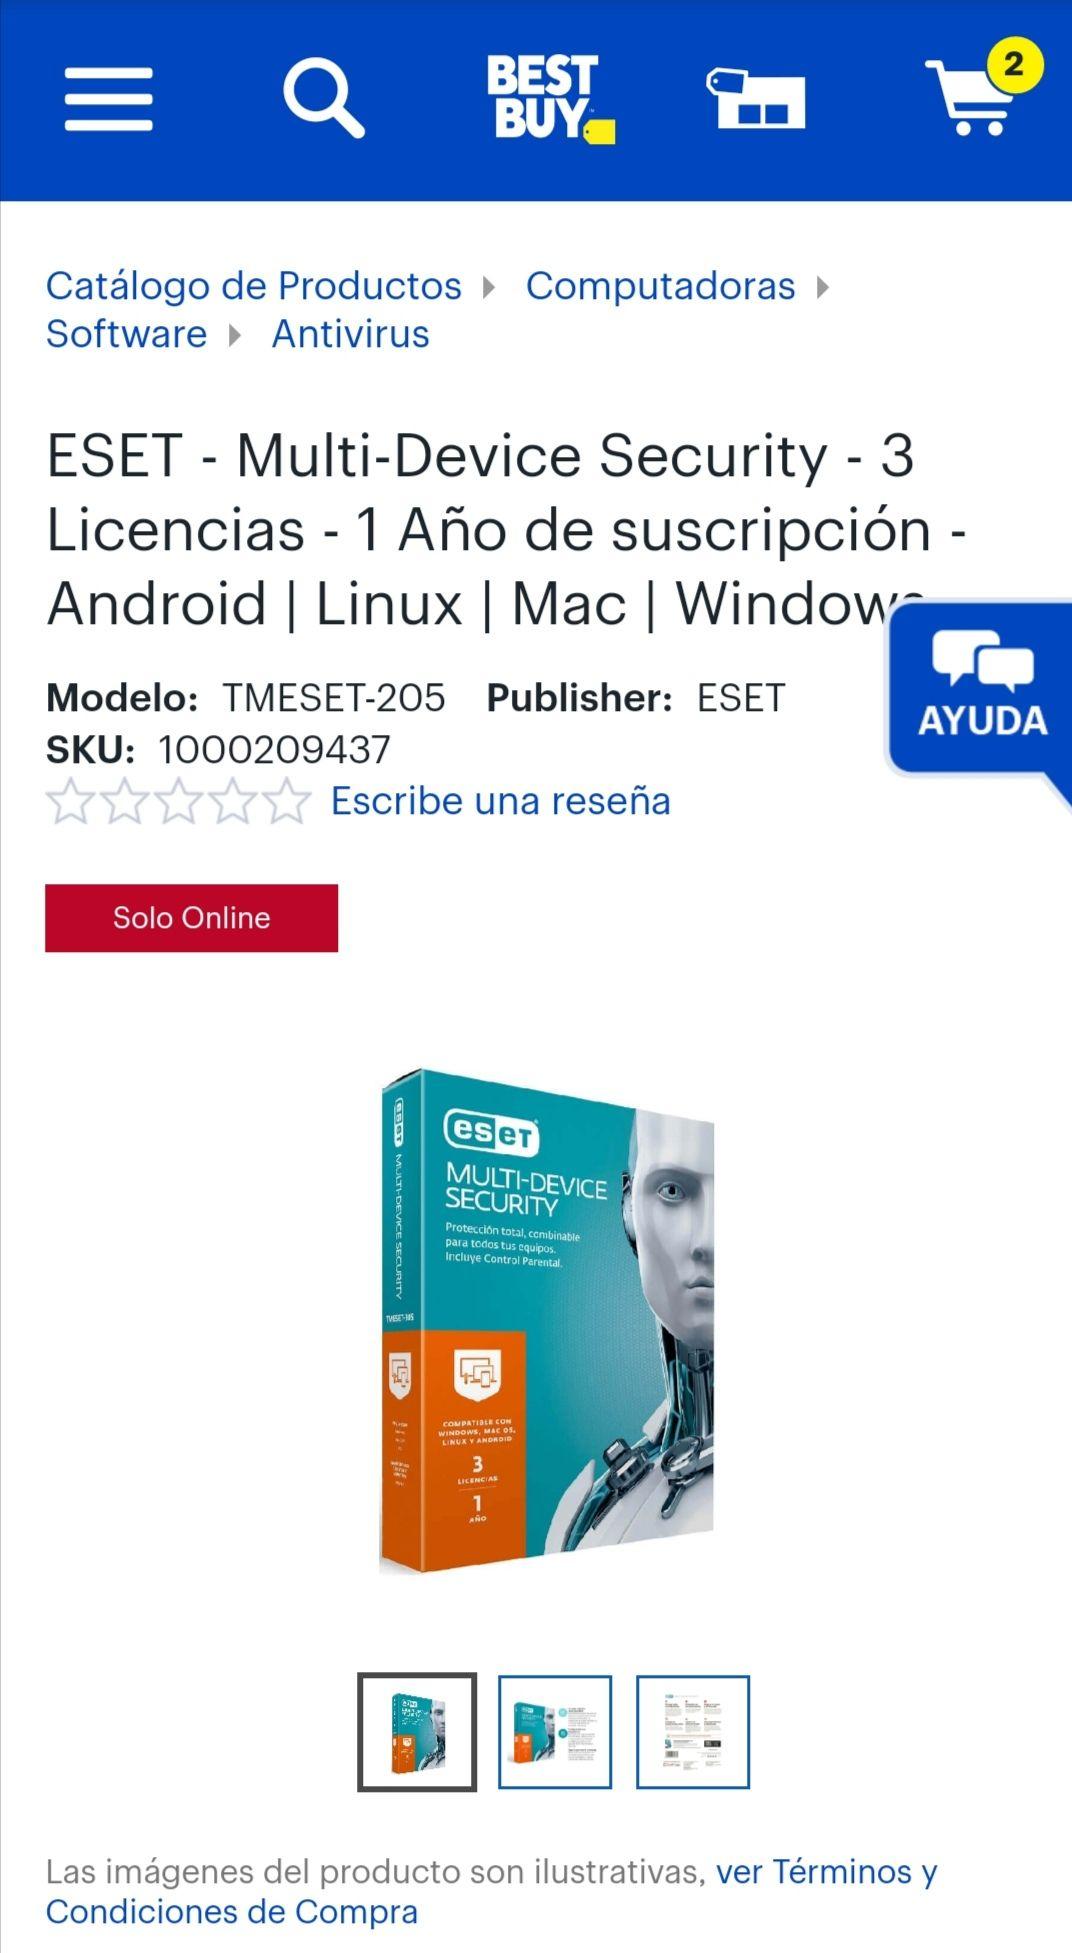 Best Buy, ESET - Multi-Device Security - 3 Licencias